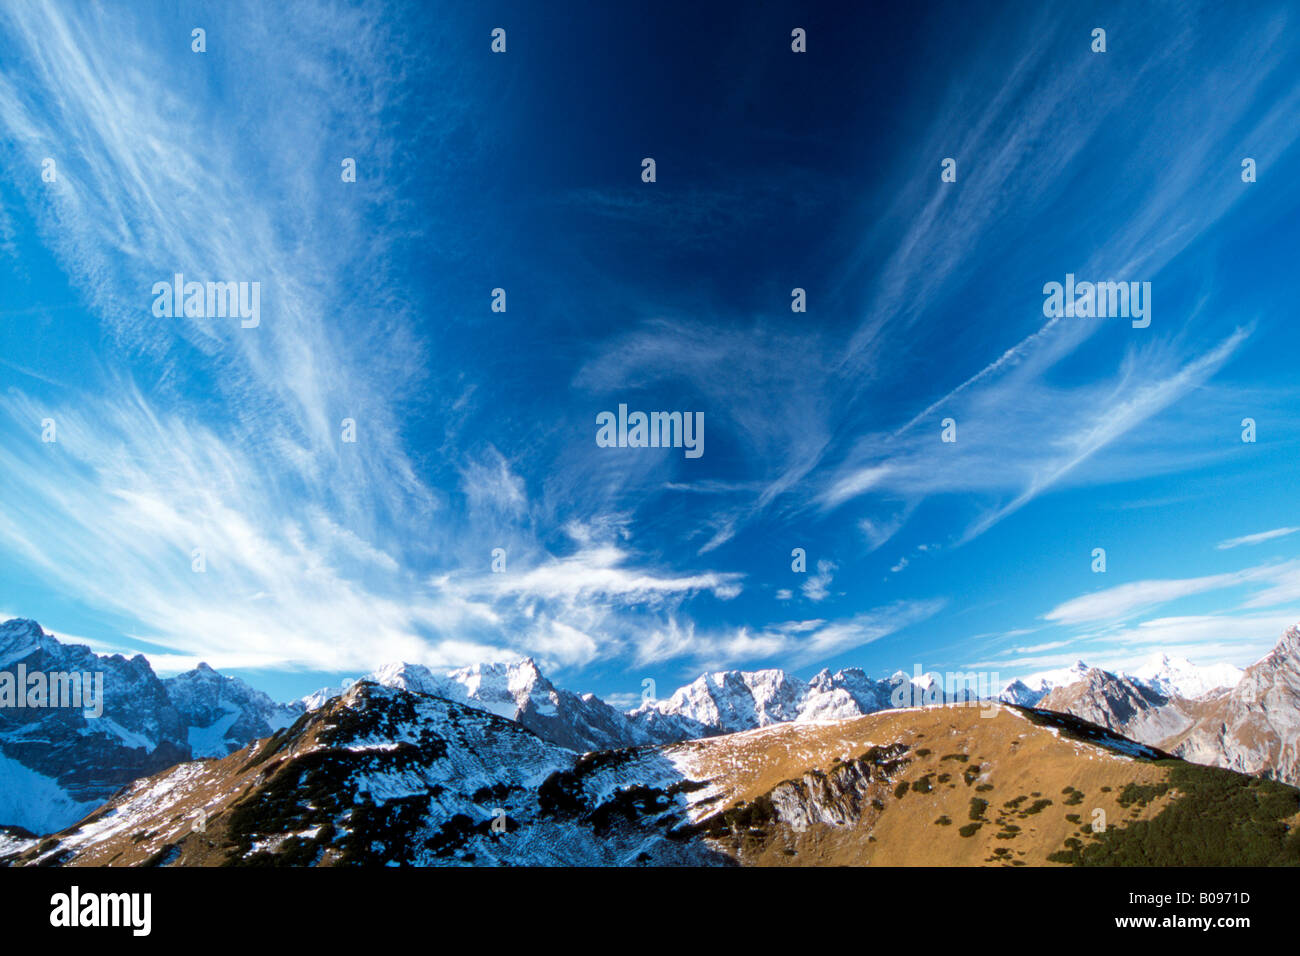 Foehn wind, Karendel Range, Tyrol, Austria, Europe - Stock Image